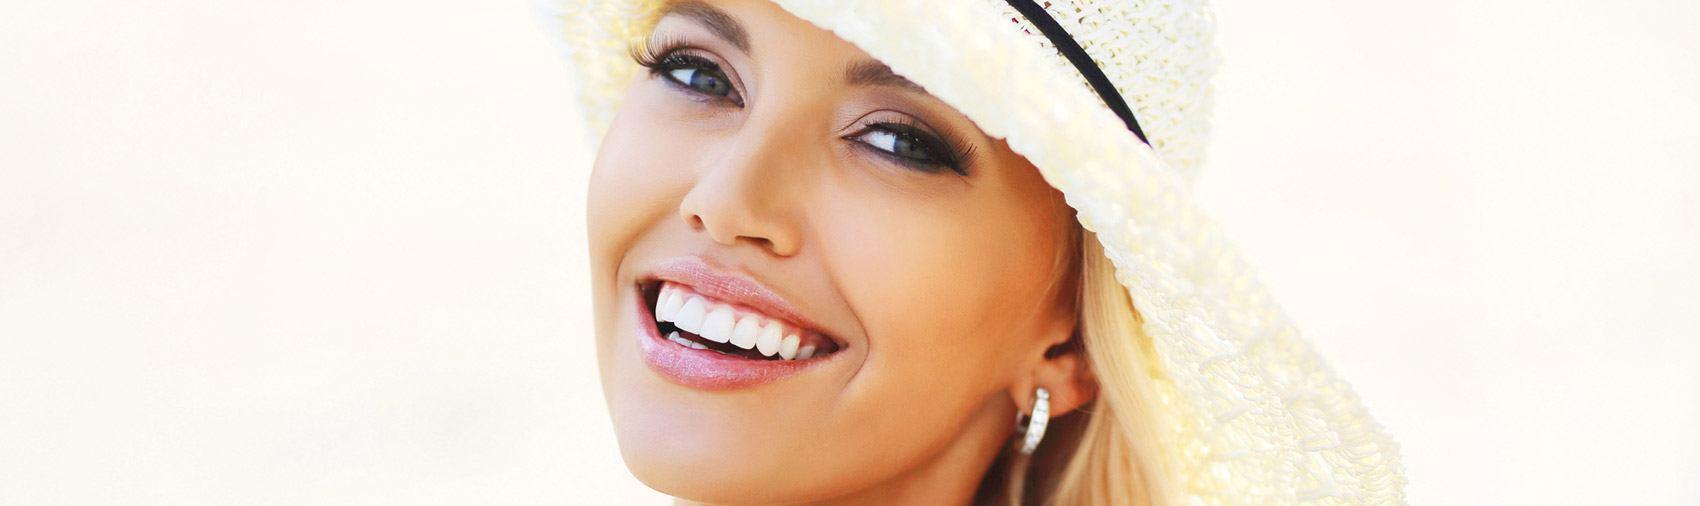 Dental Sealants - Meredith Levine, DDS, Inc.